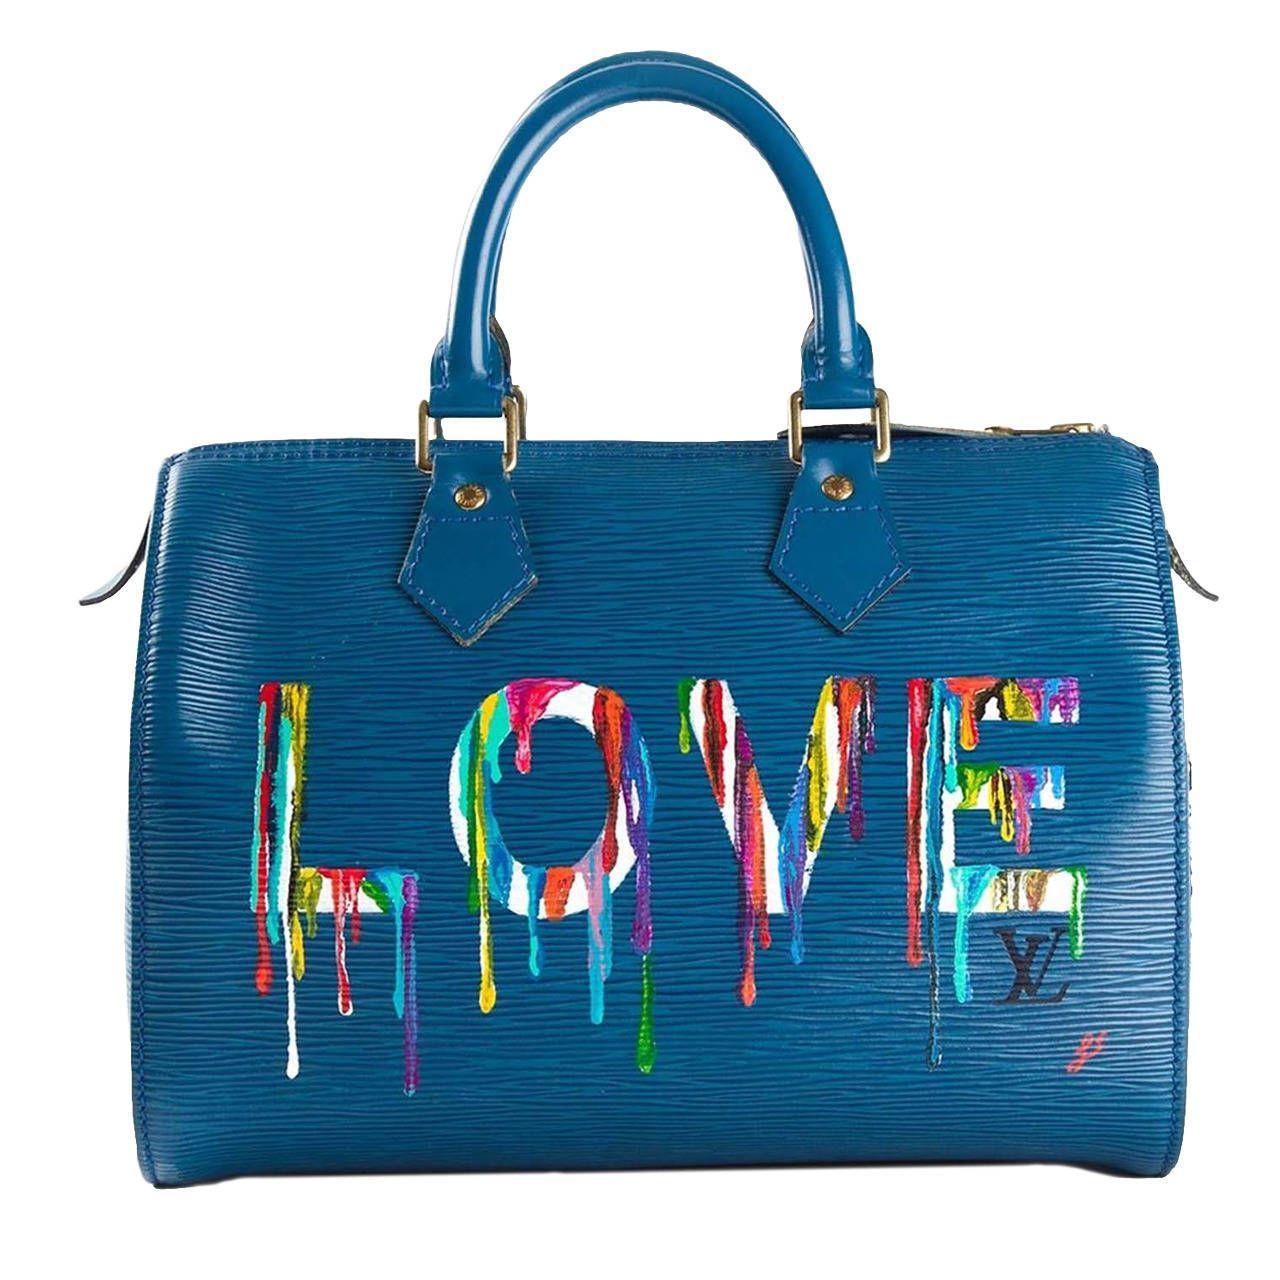 Louis Vuitton Hand Painted Blue Epi Speedy Bag   Bag Lady ... 40ad38526a3